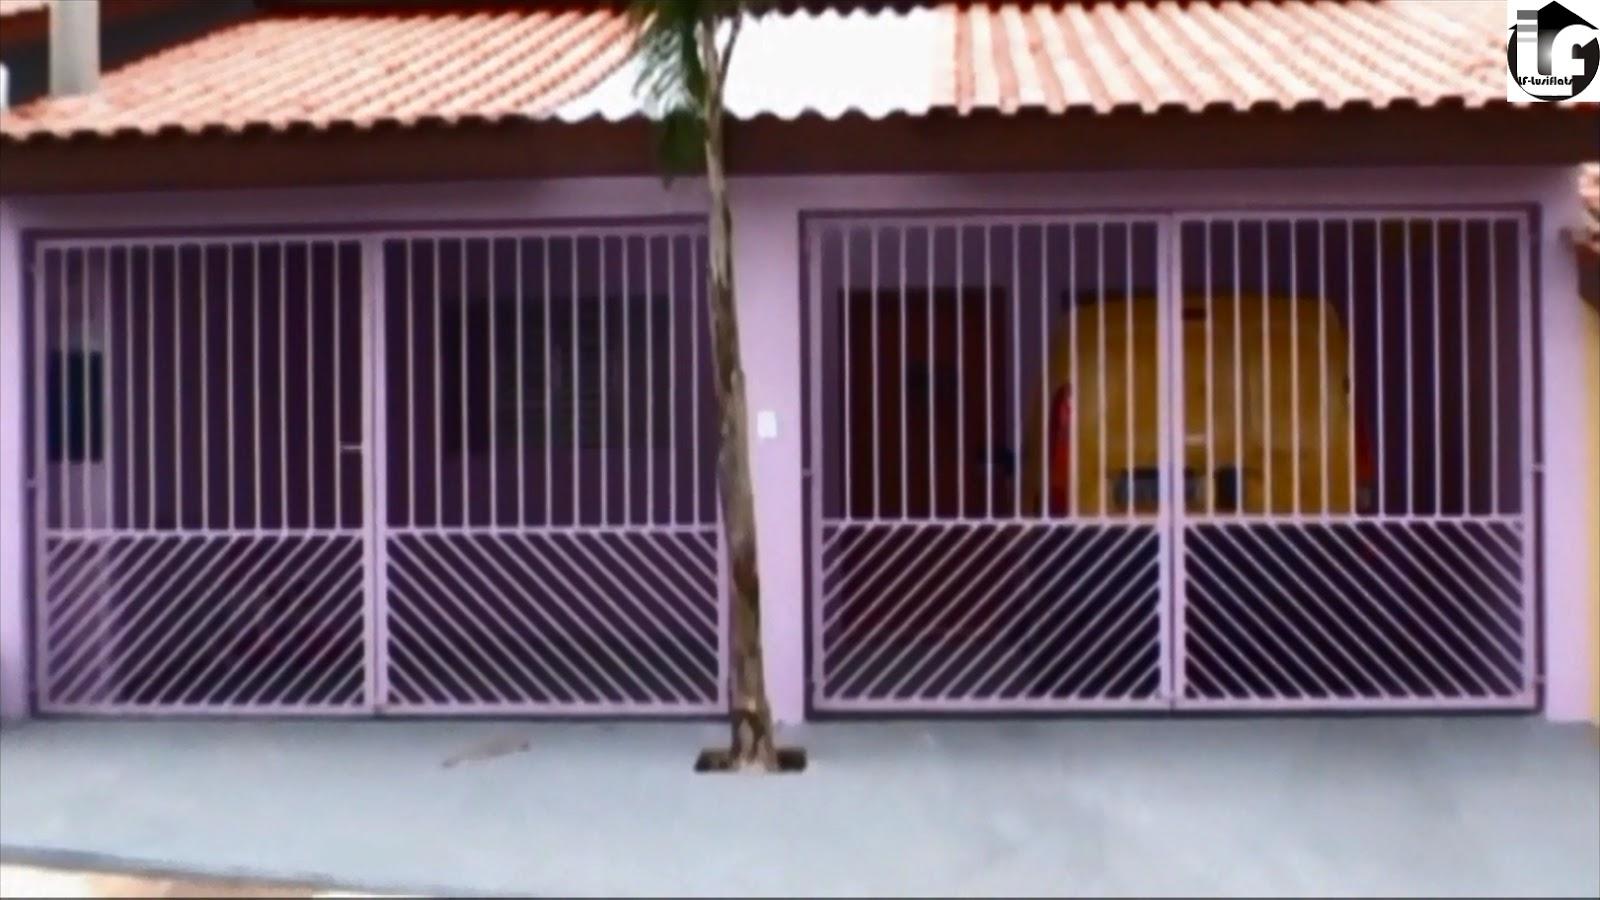 fachada lilás portões metal garagem 2 vagas #965235 1600 900